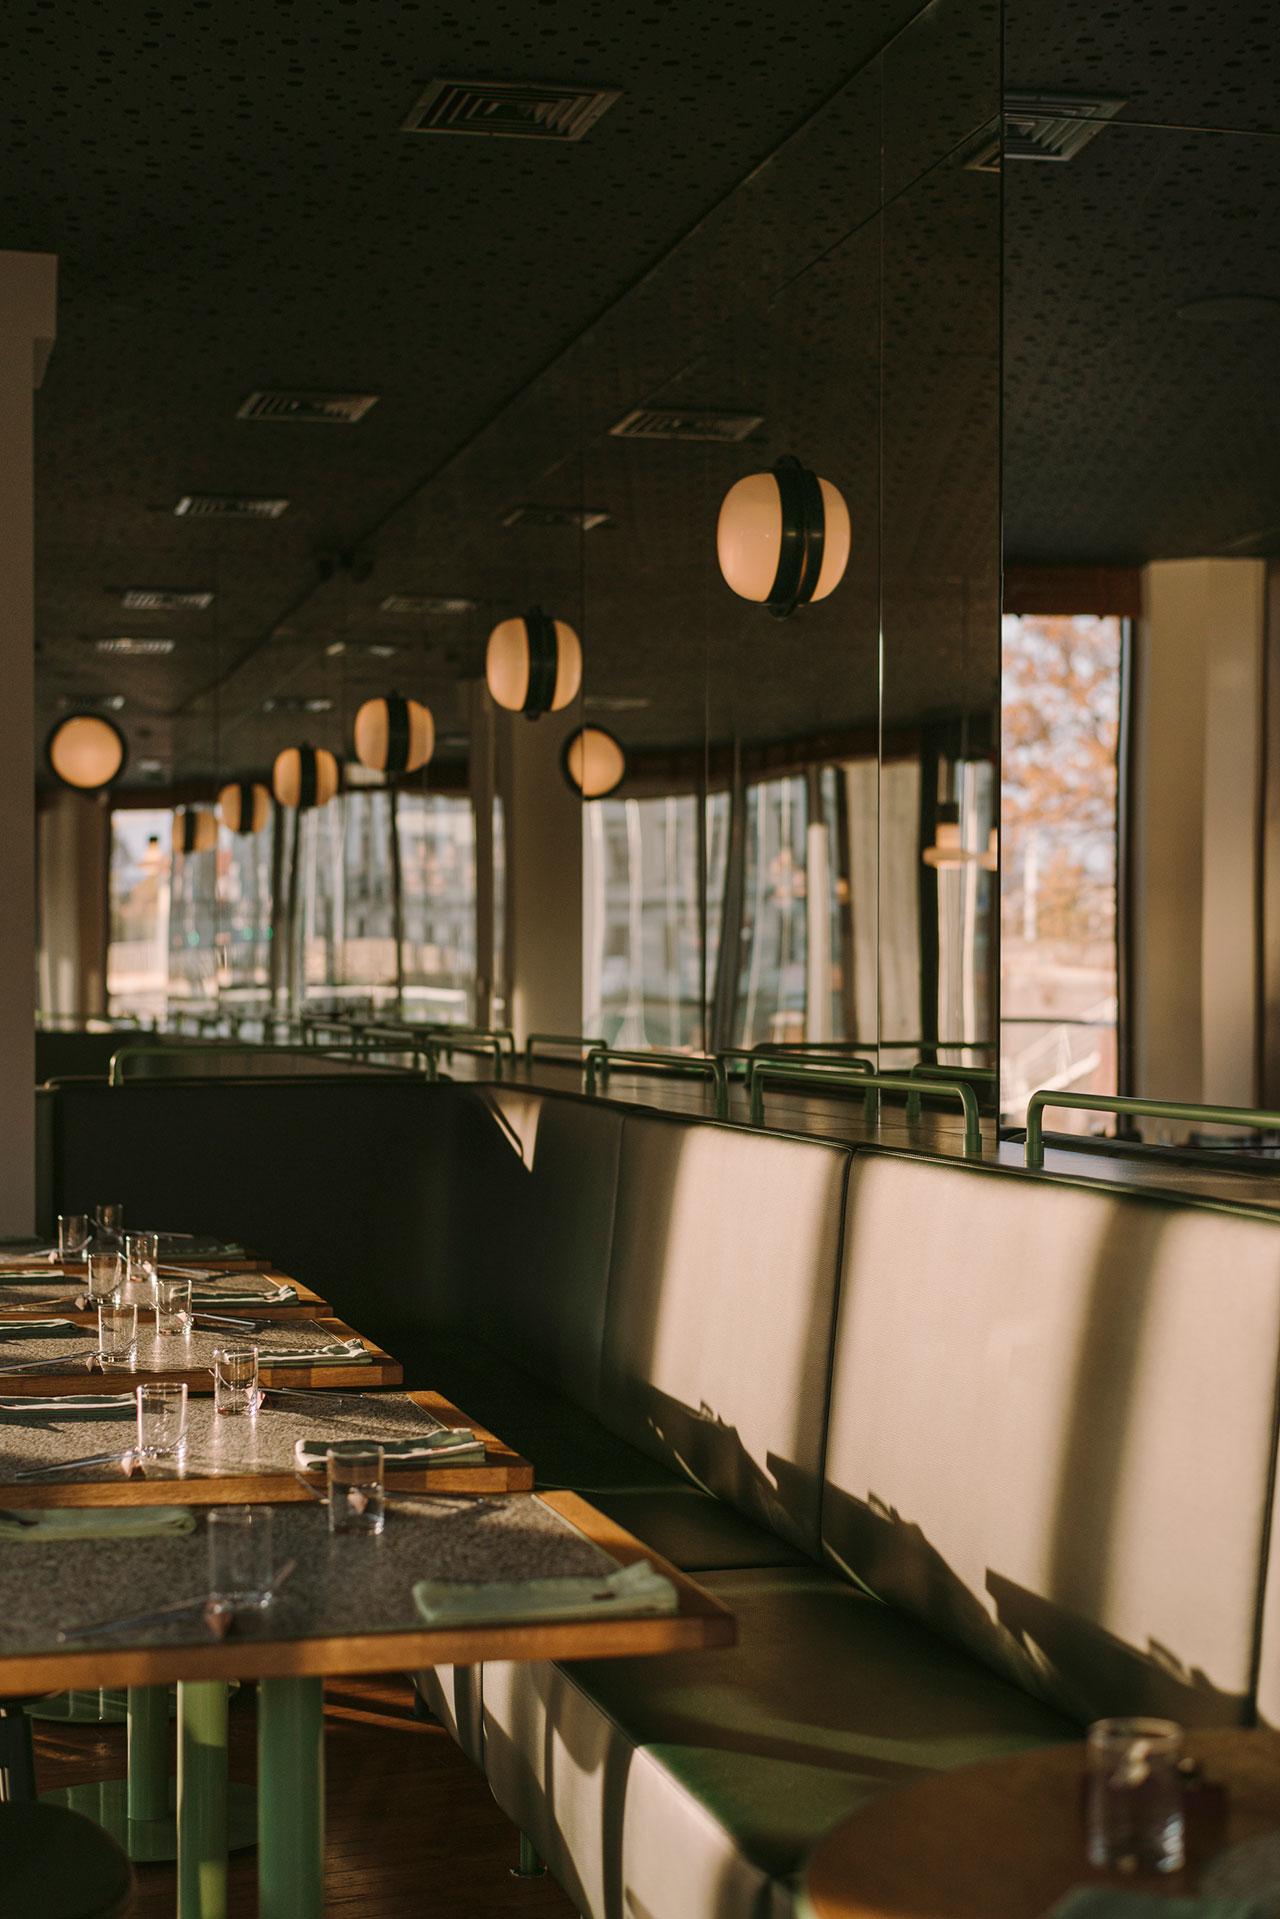 MARTIM restaurant by BUCK.STUDIO. Photo byPION Studio.